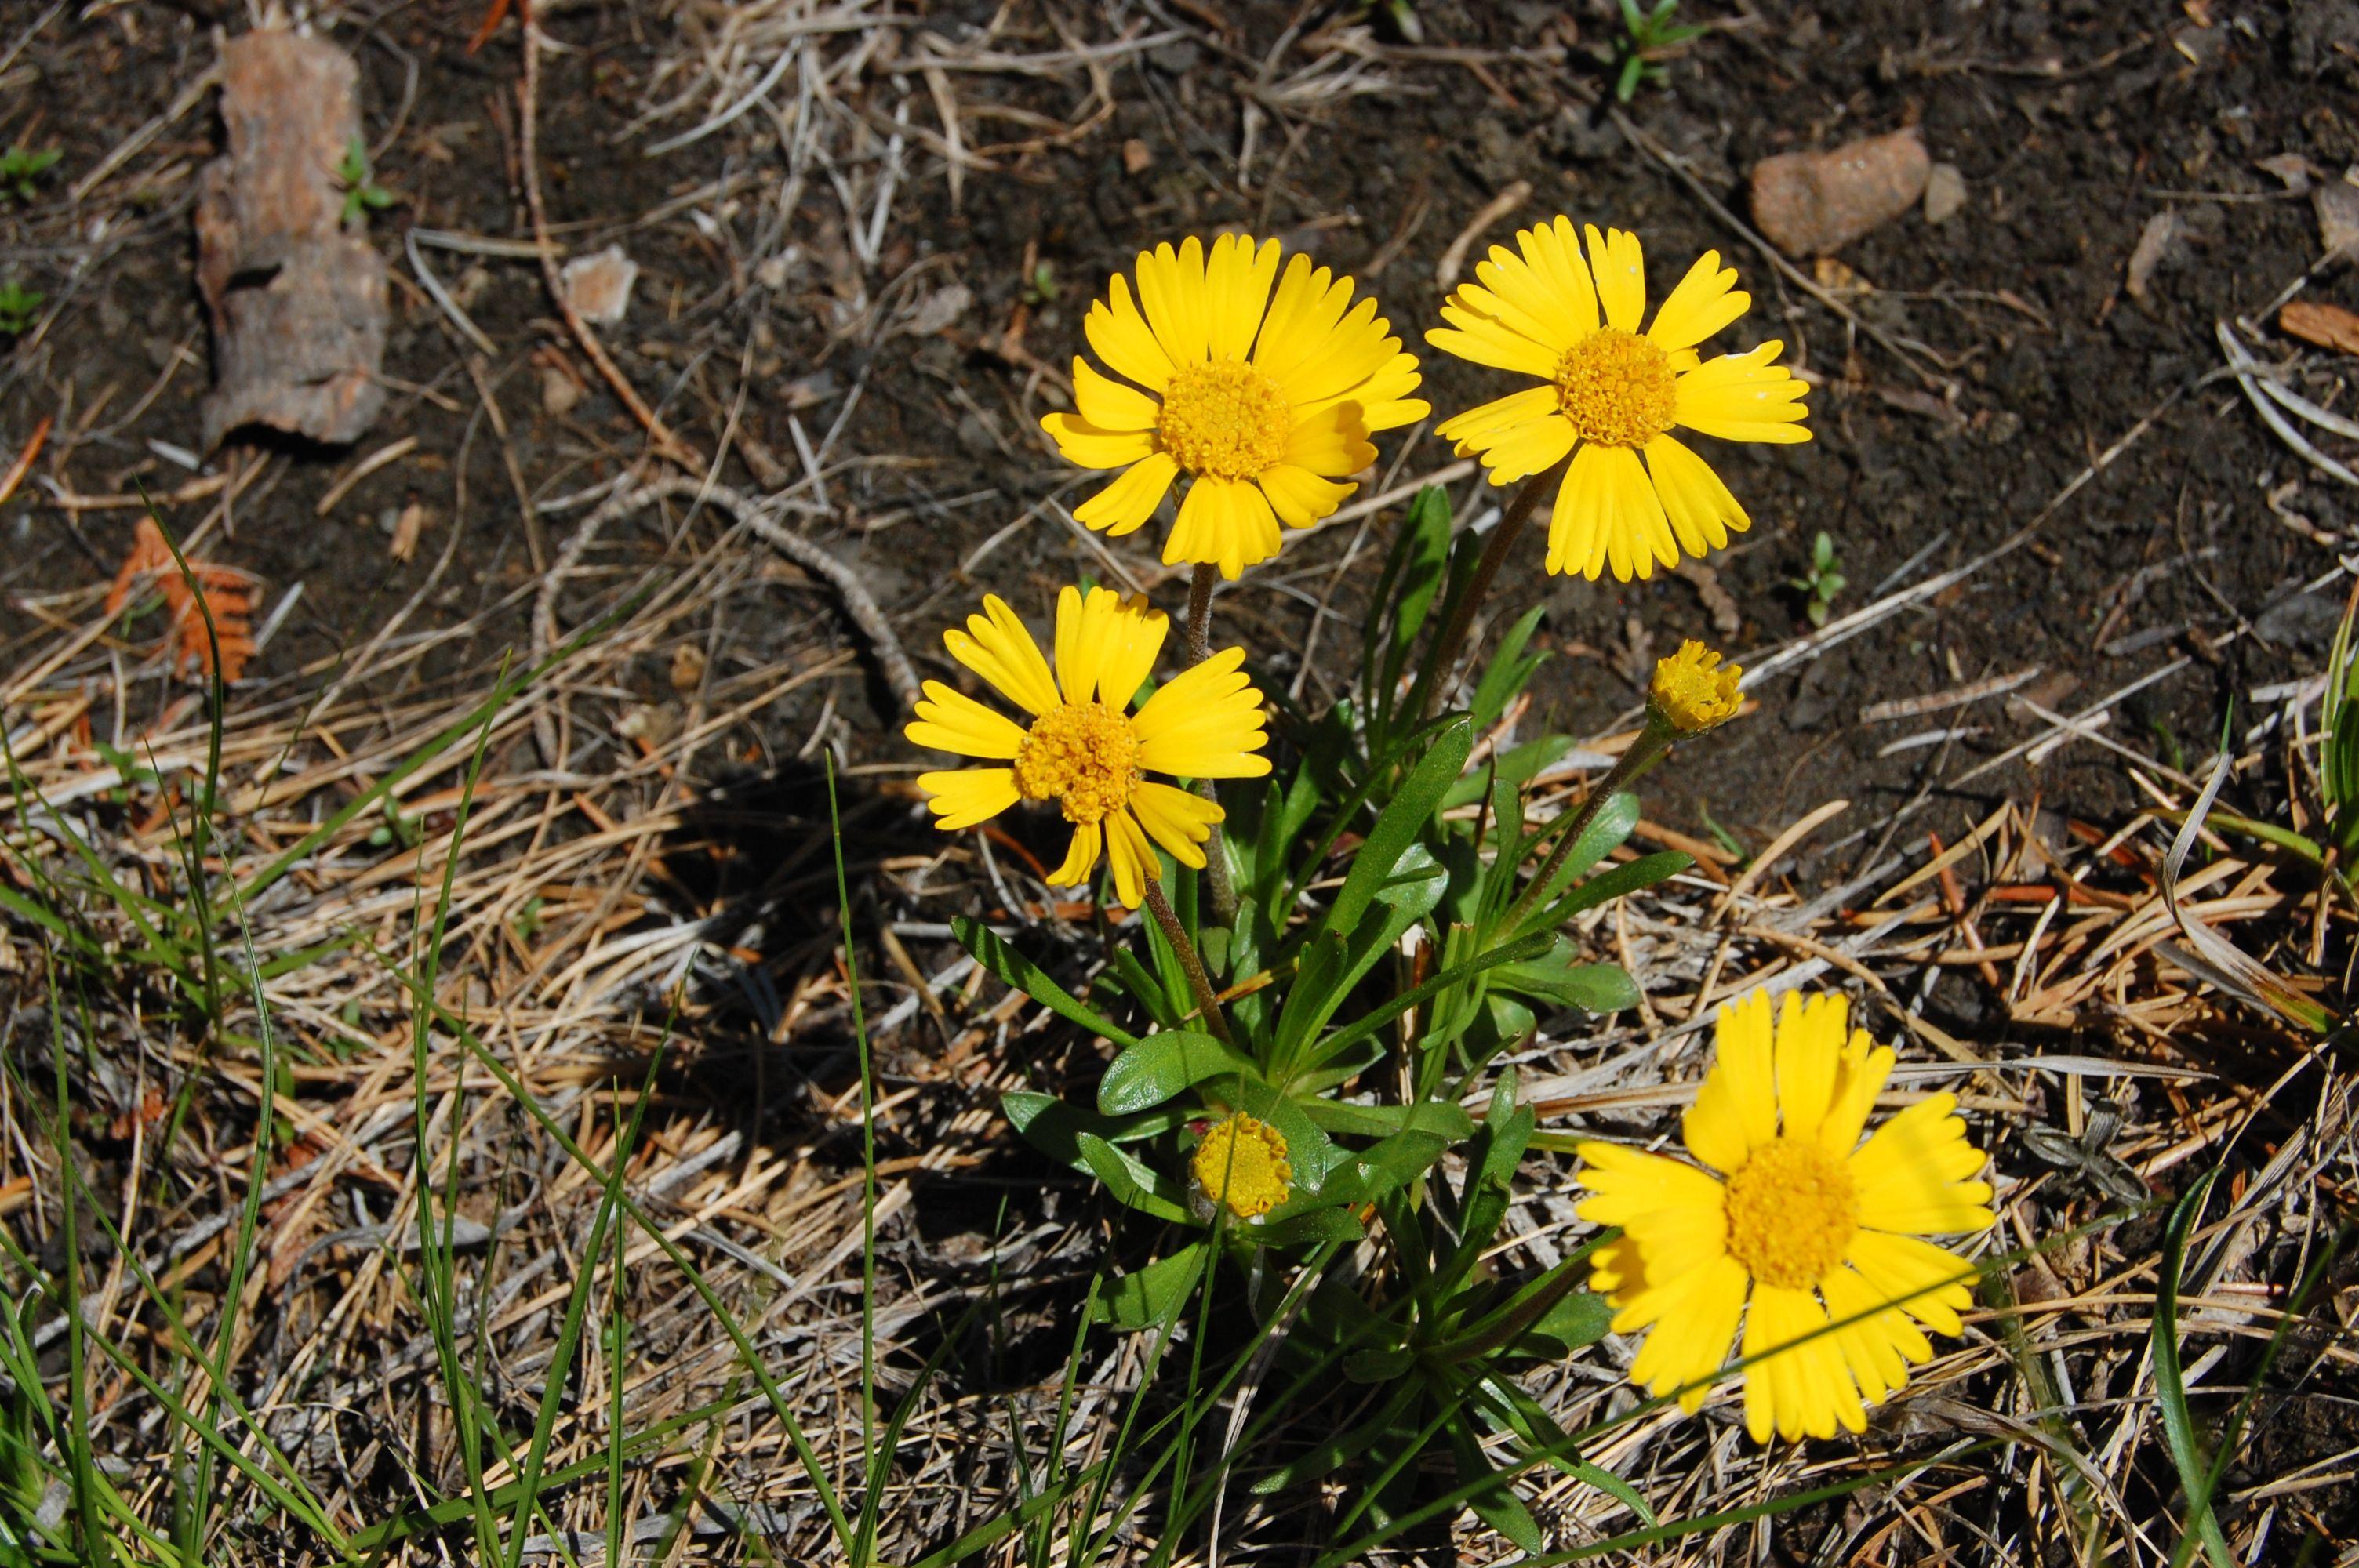 Lakeside daisy tetraneuris herbacea saro threatened on